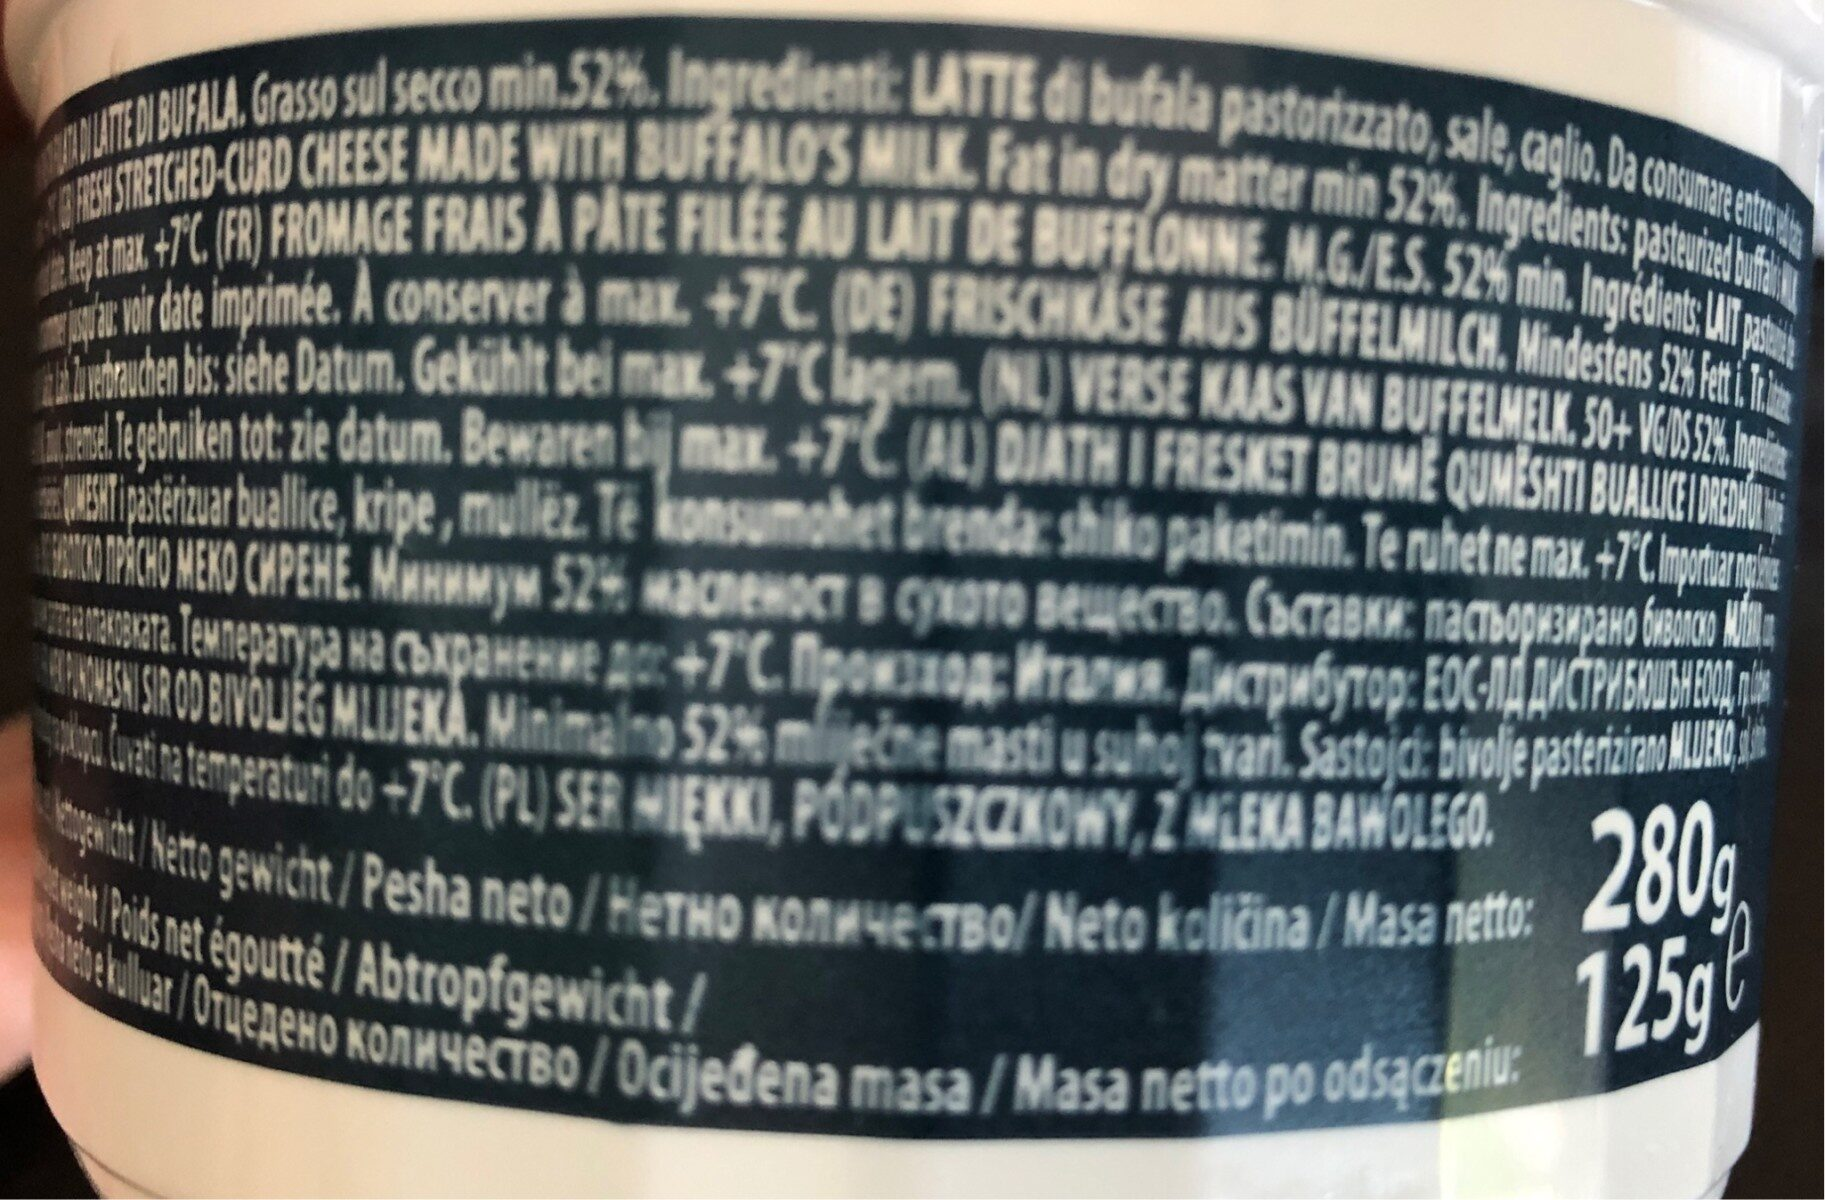 Zanetti Fresh Mozarella Cheese Buffalo Cup (125 G) - Ingredients